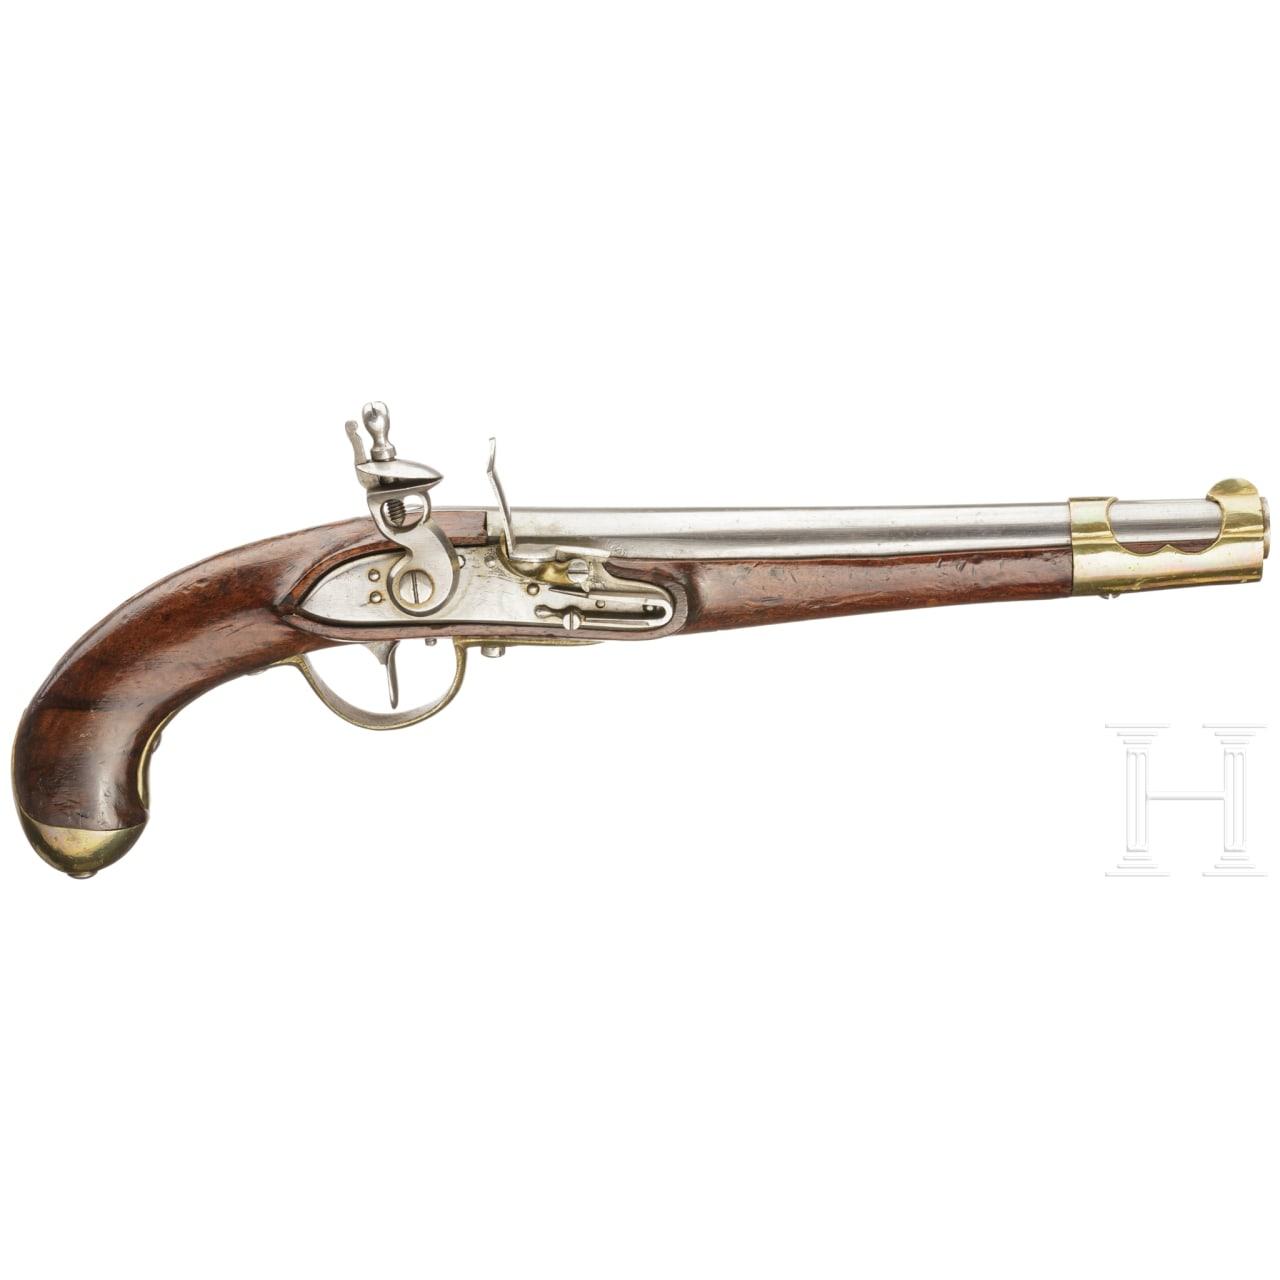 An M 1798 cavalry pistol